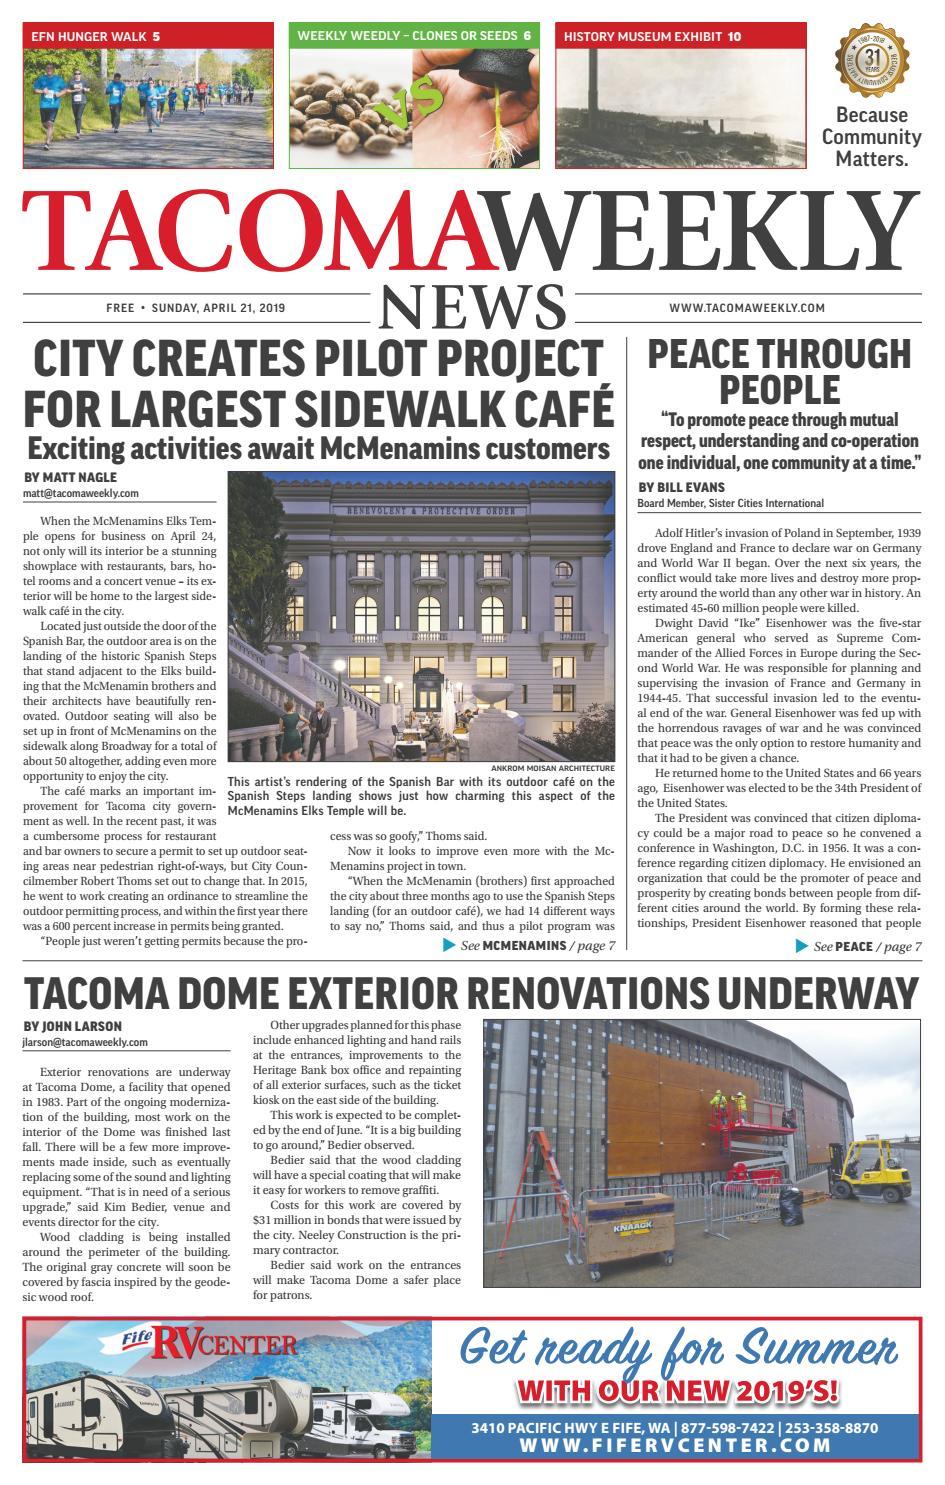 Tacoma Weekly 04 21 19 by Tacoma Weekly News - issuu